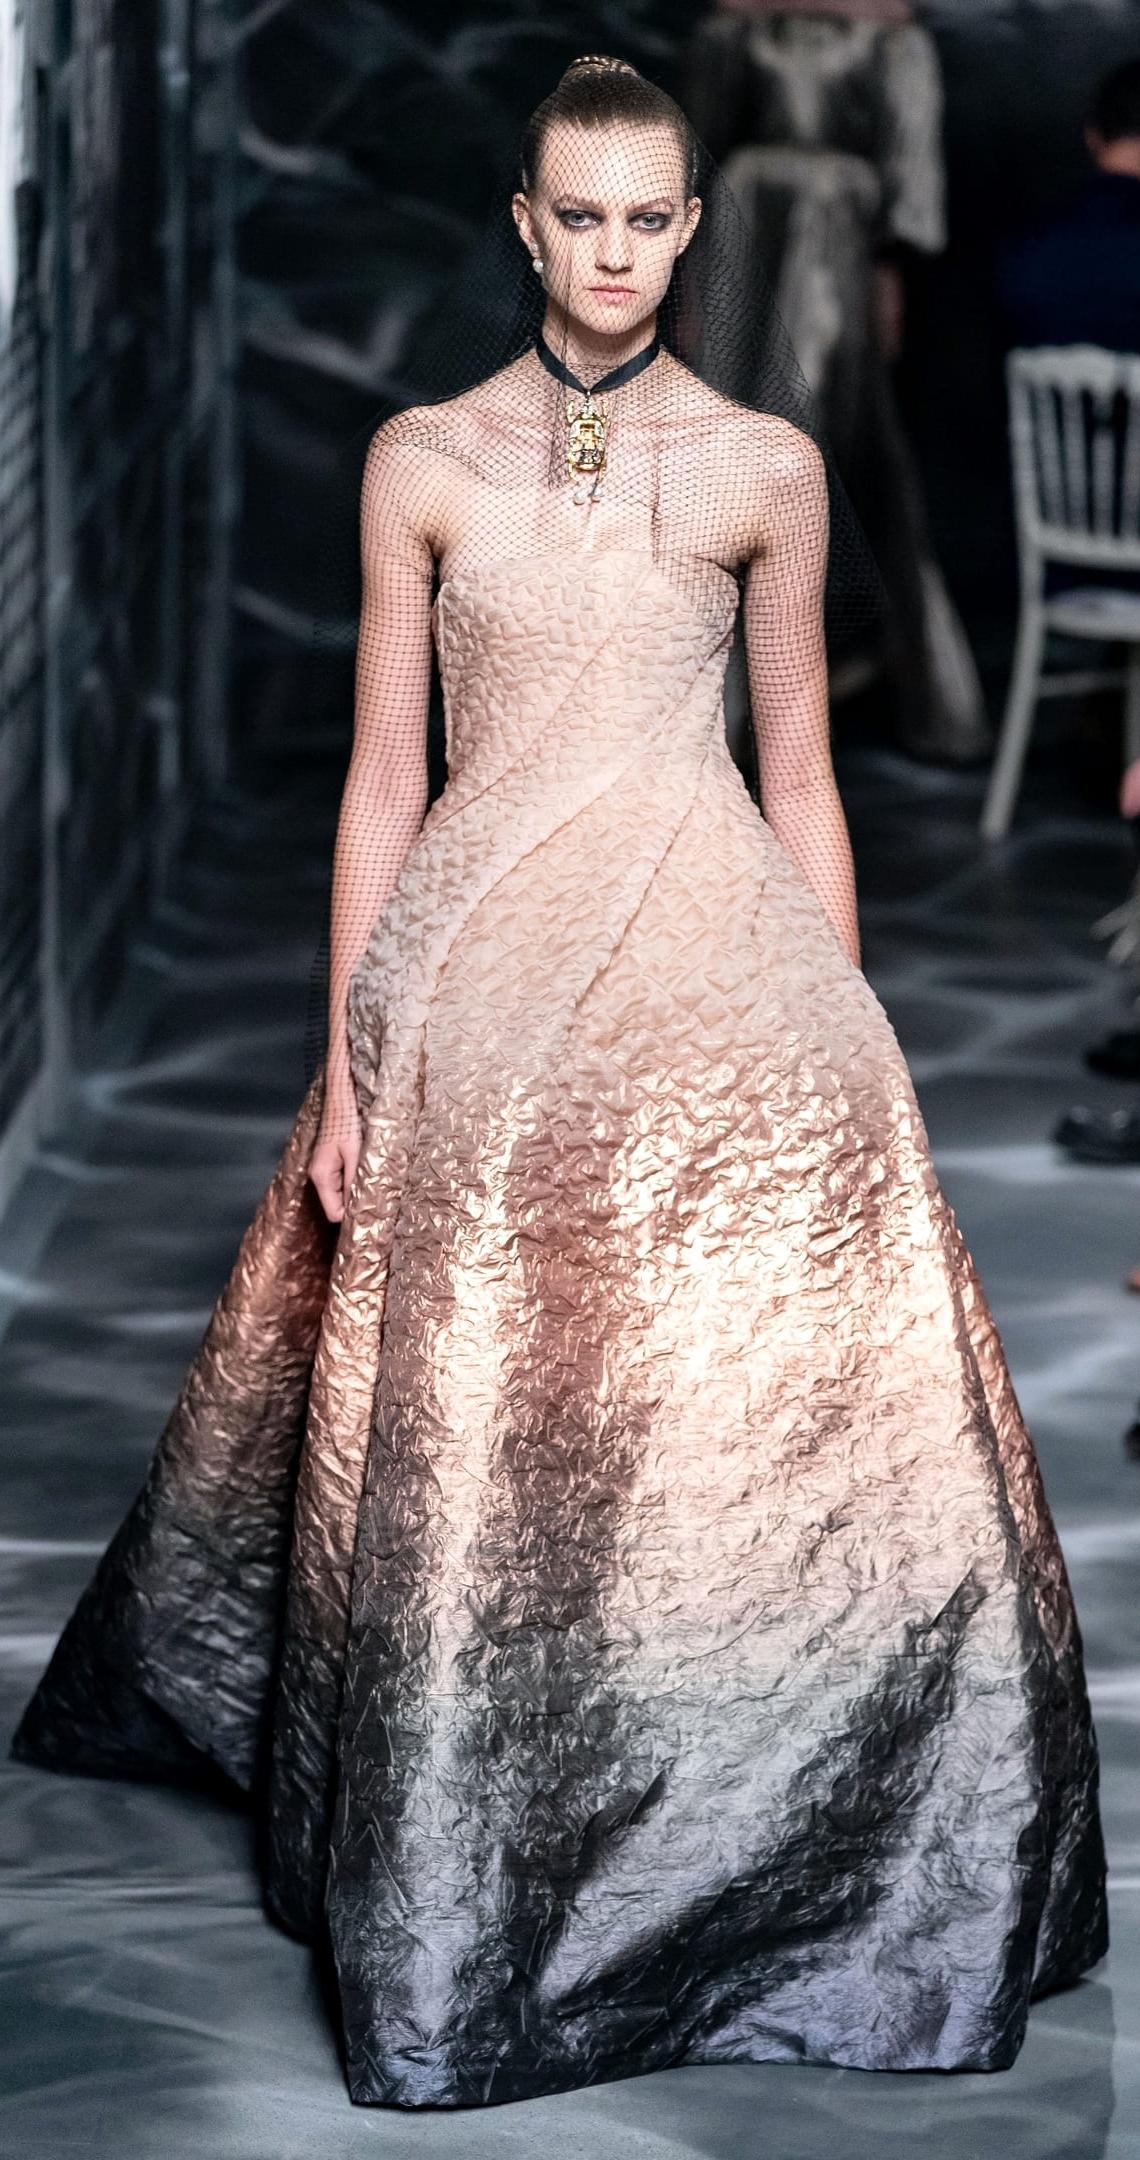 Christian Dior Fall/Winter 2019 Couture - обзор коллекции